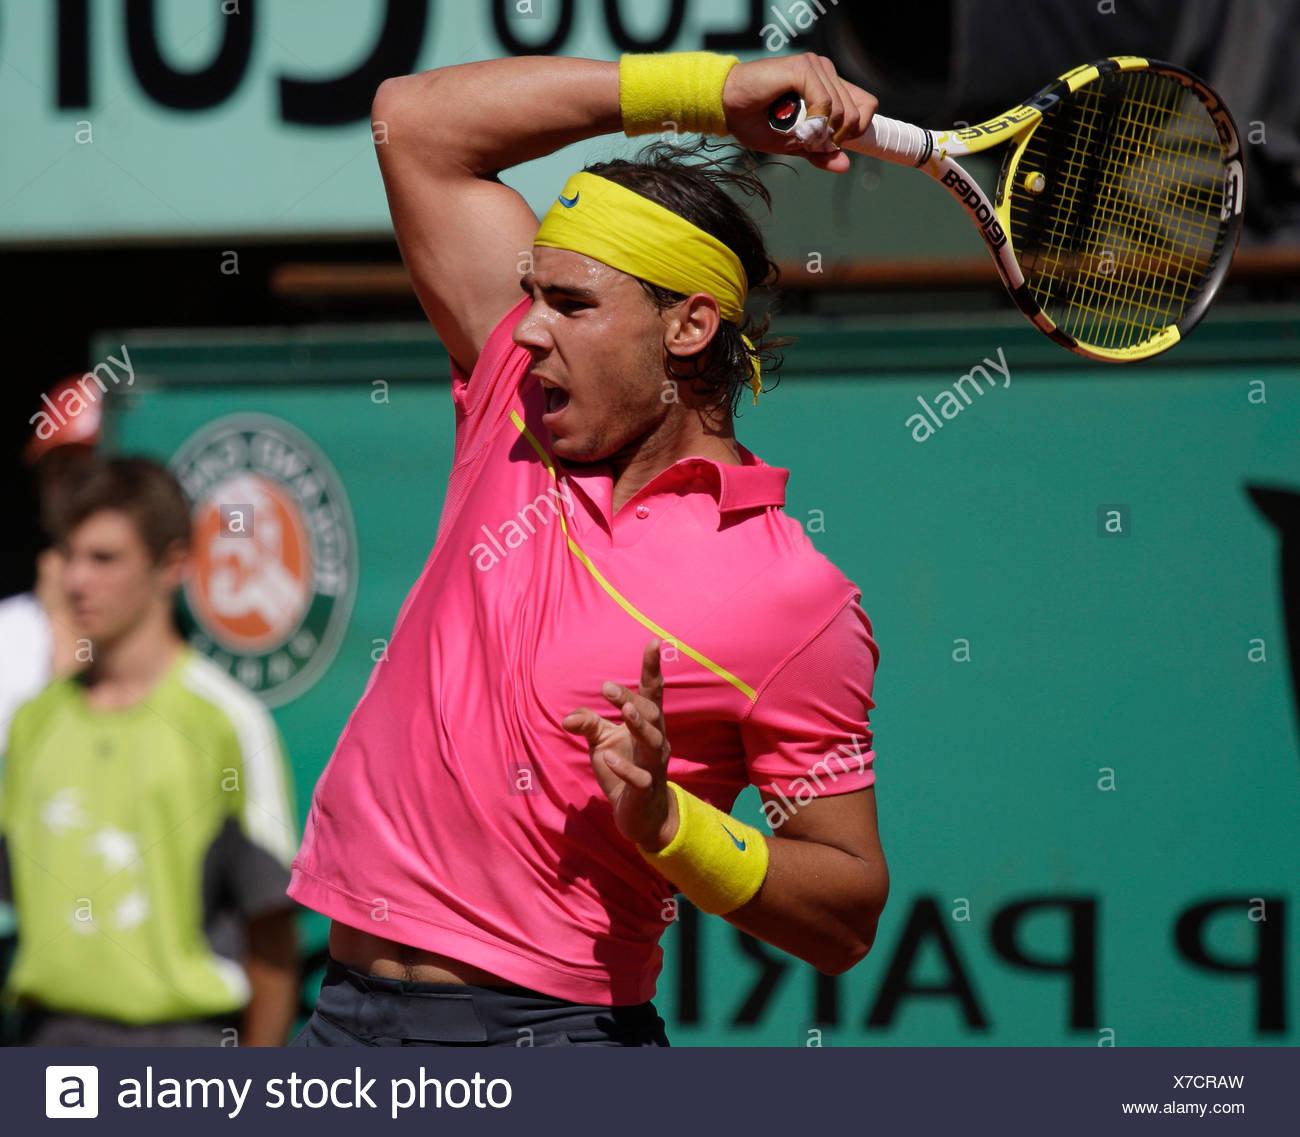 Rafael Nadal, Spagna, servire, dynamics, tennis, il ITF Grand Slam torneo, French Open 2009, Roland Garros, Parigi, Francia Immagini Stock